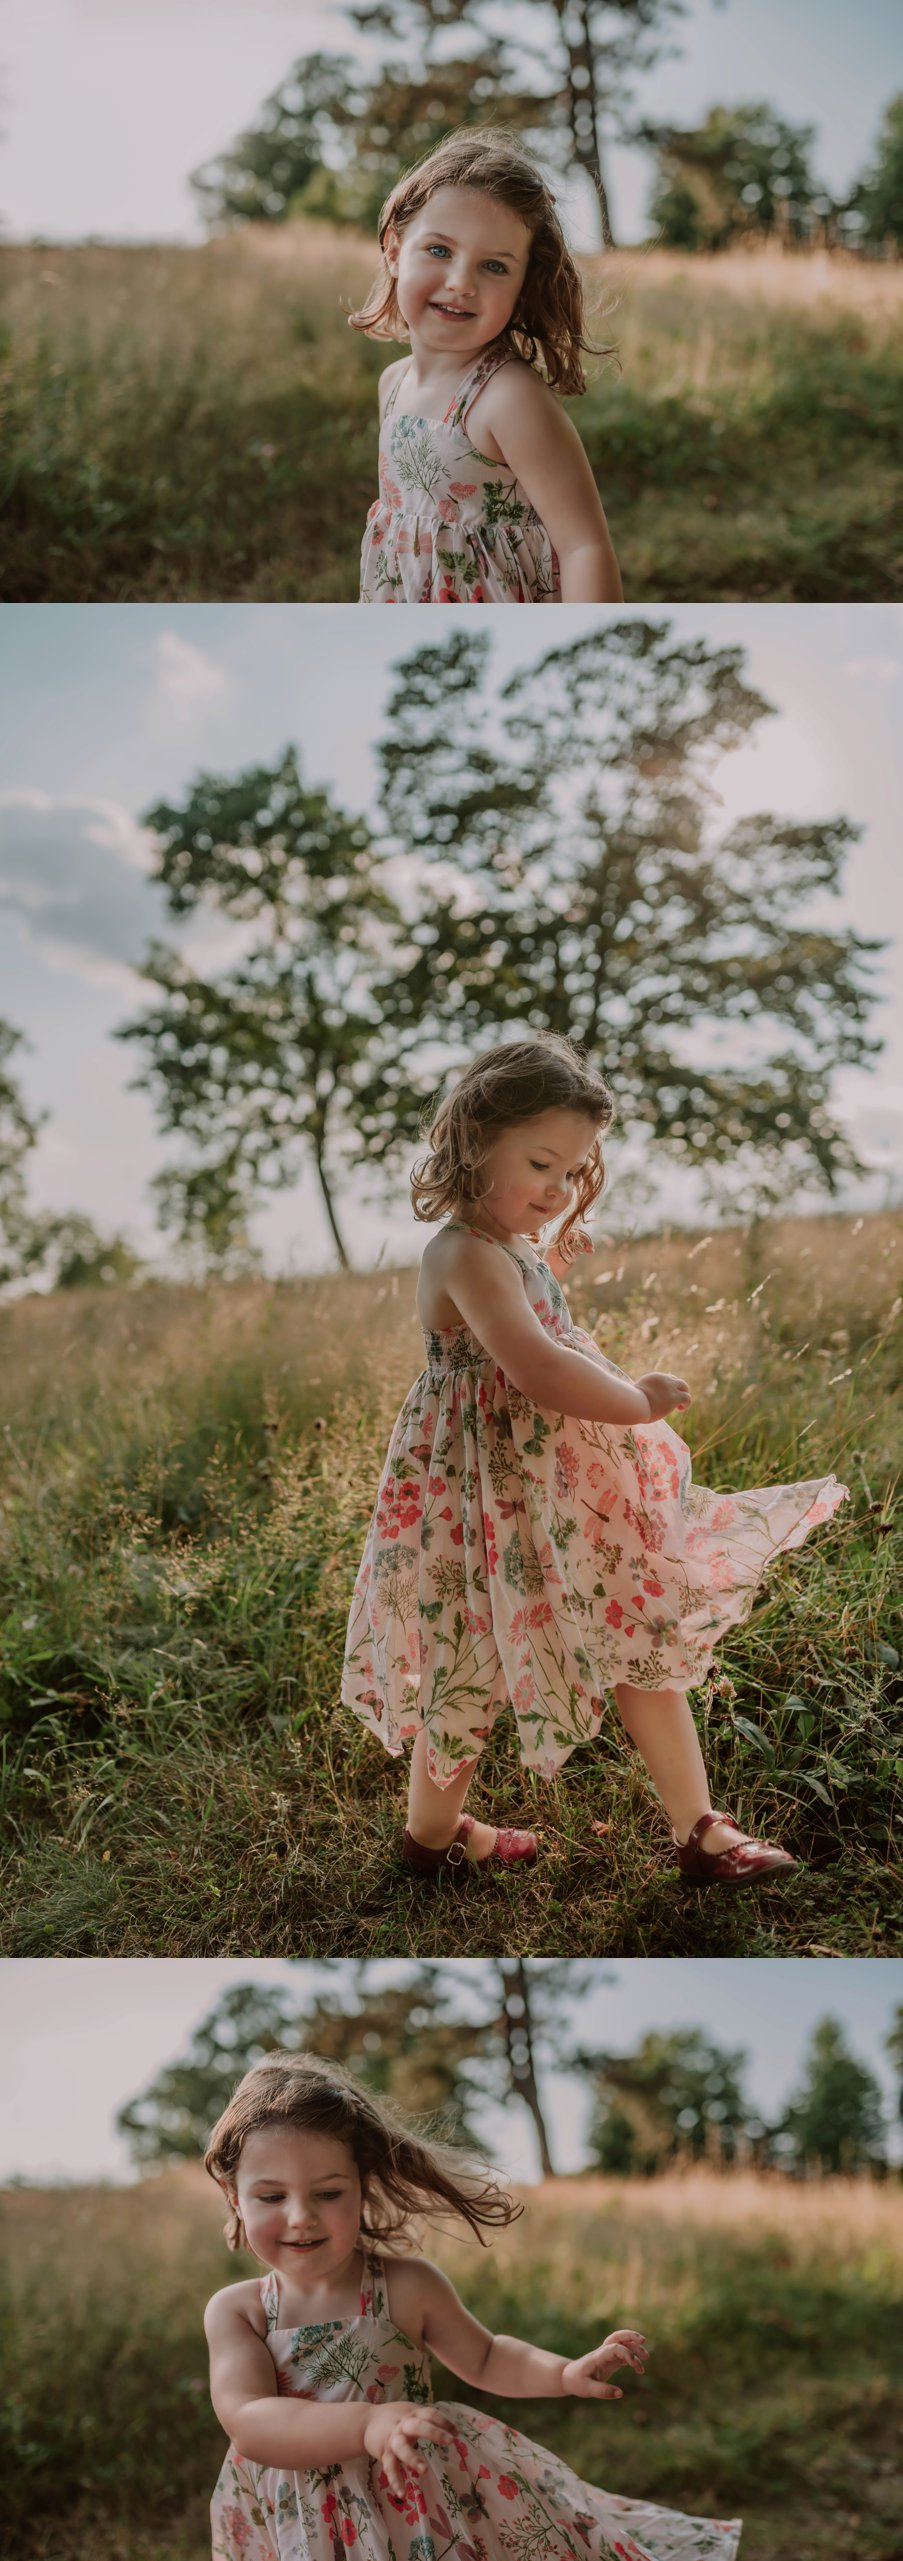 Summers_August_2018-66_Beautiful_Natural_Portraits_by_Award_Winning_Boston_Massachusetts_Family_Portrait_Photographer_Asher_and_Oak_Photography.jpg